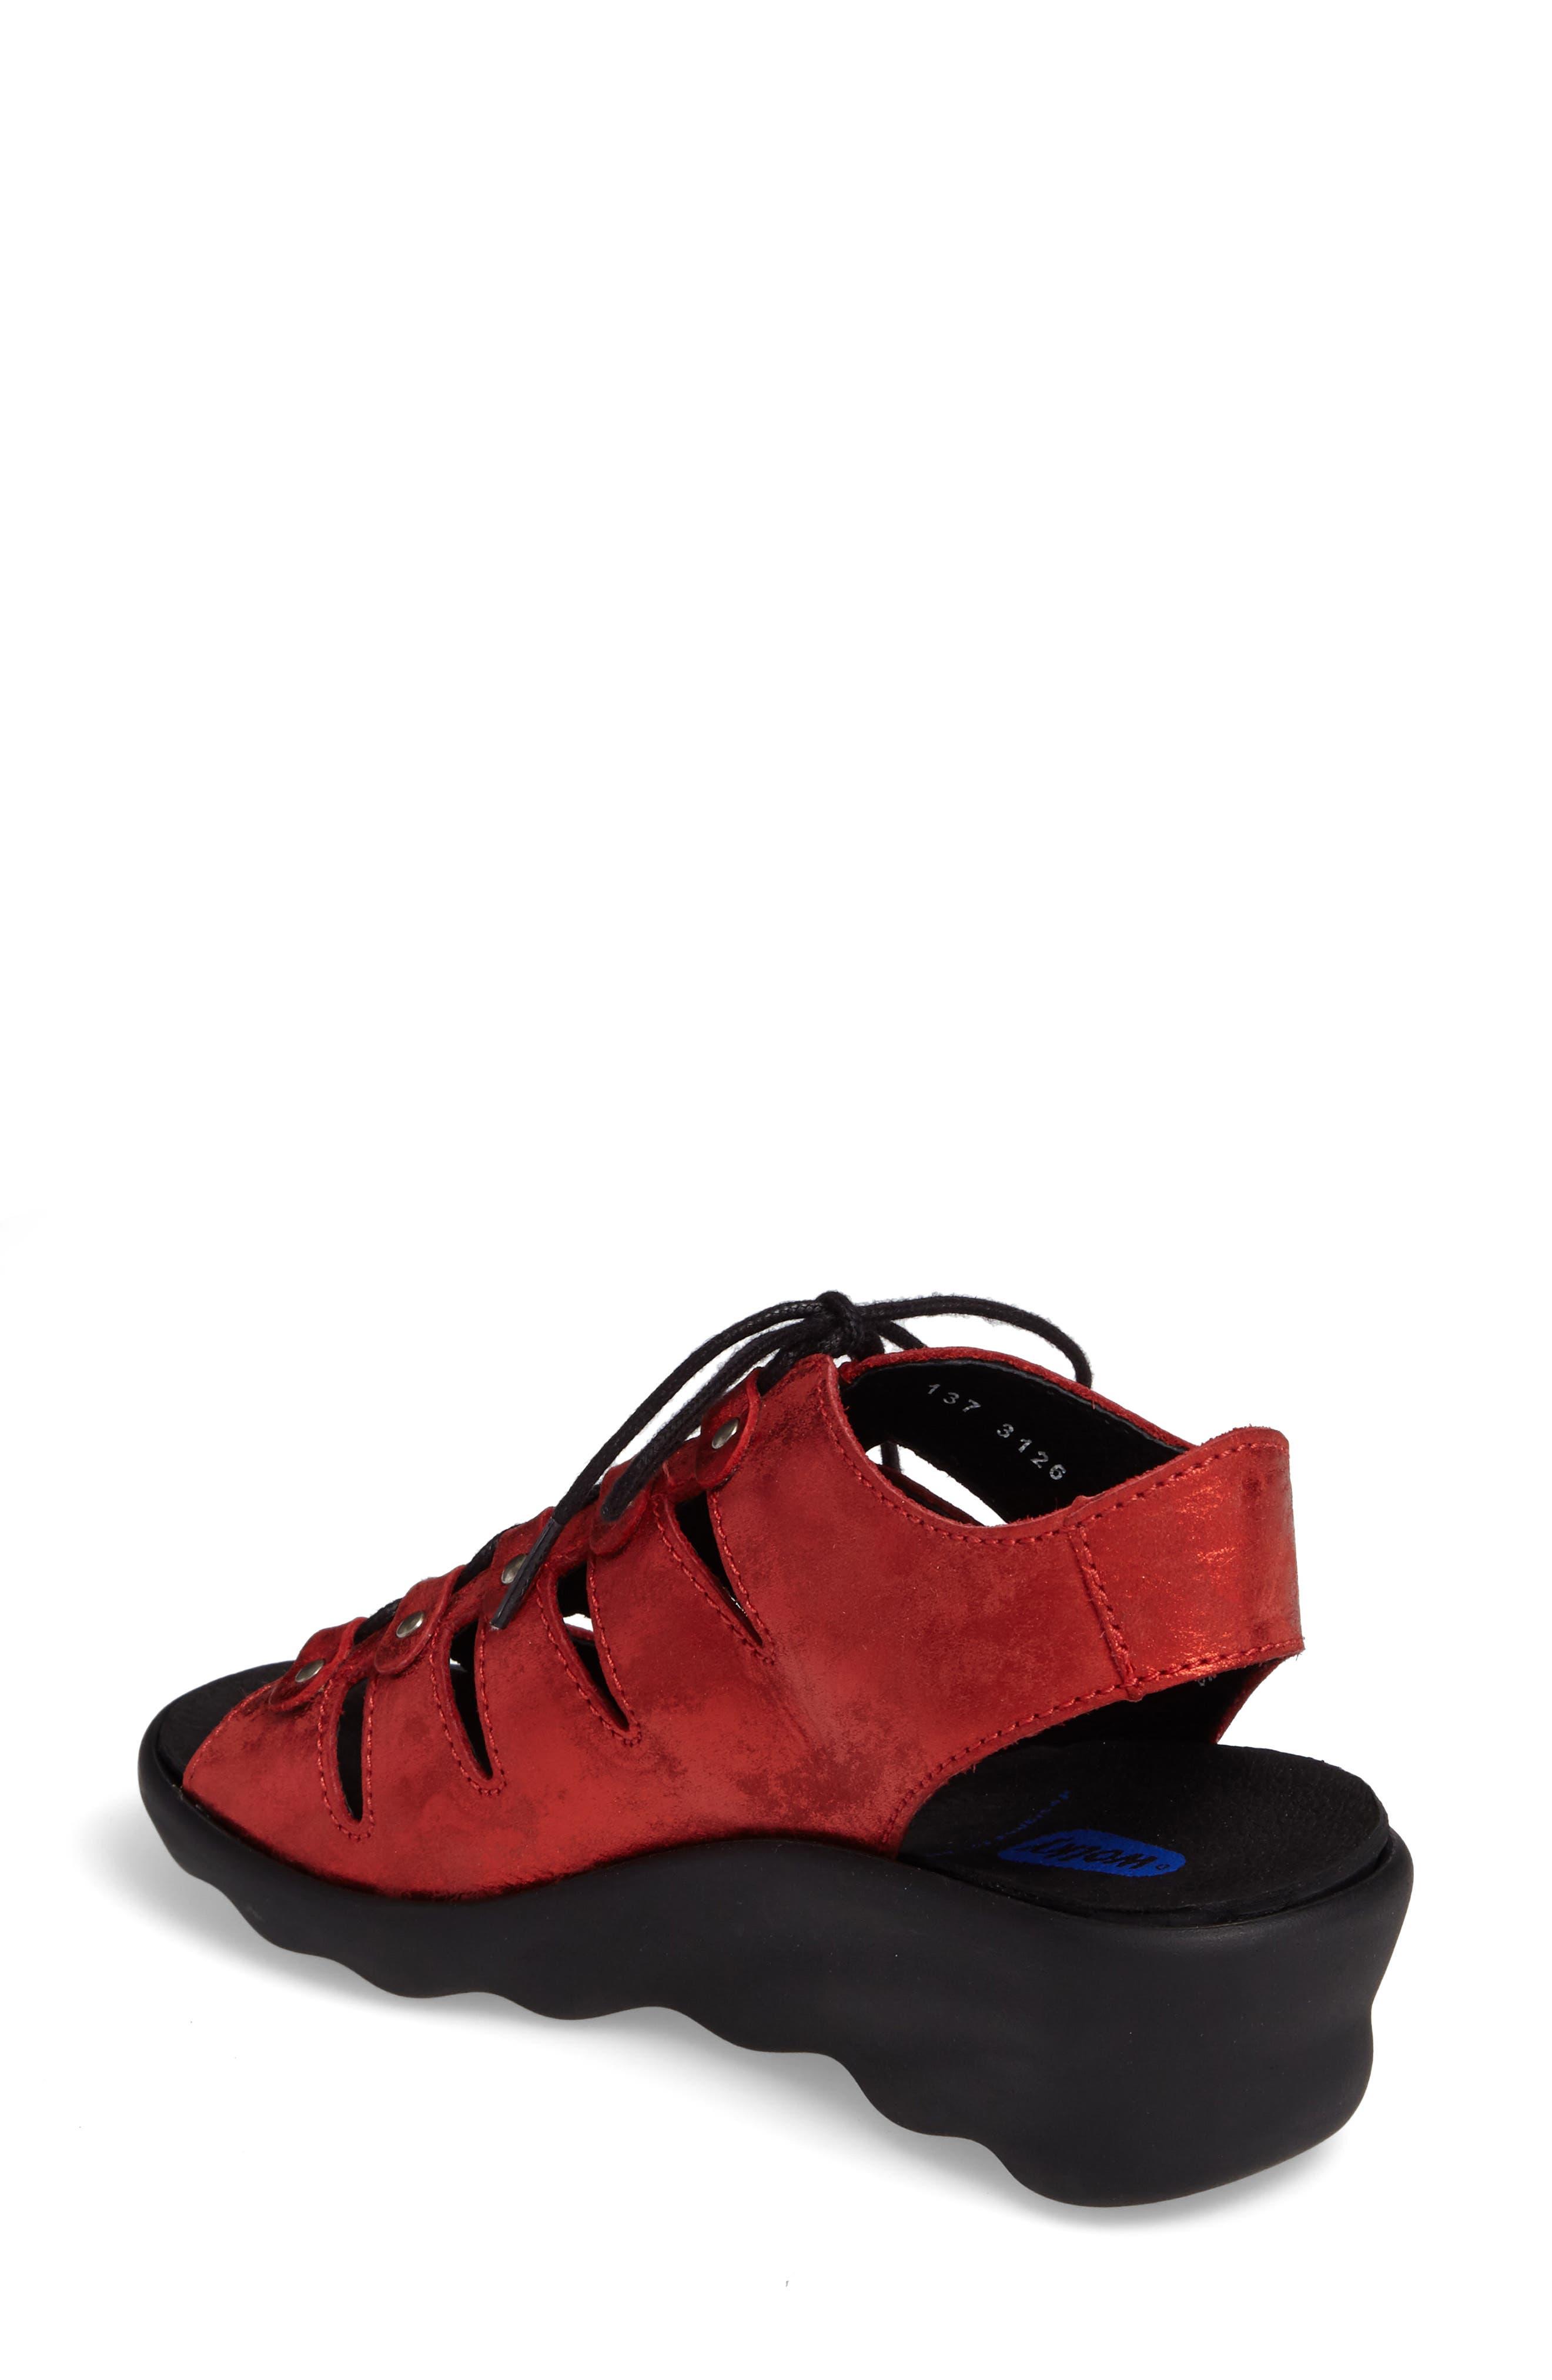 Alternate Image 2  - Wolky Arena Sandal (Women)